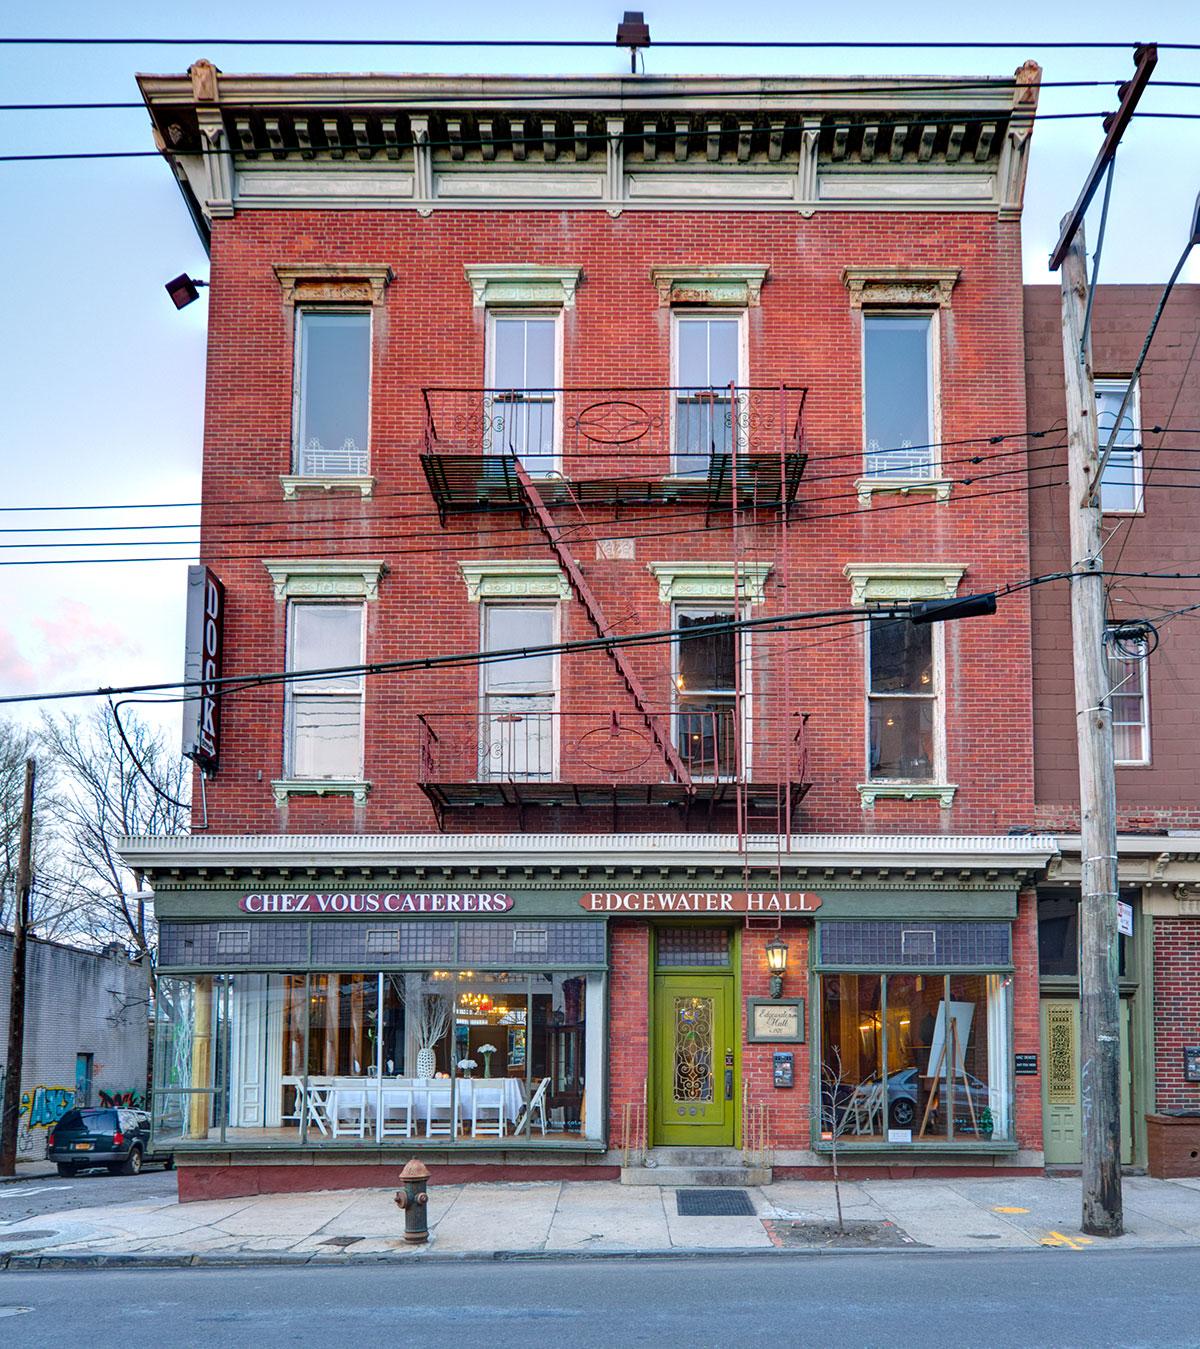 Staten Island Film Locations: Edgewater Hall, Rick's Cafe